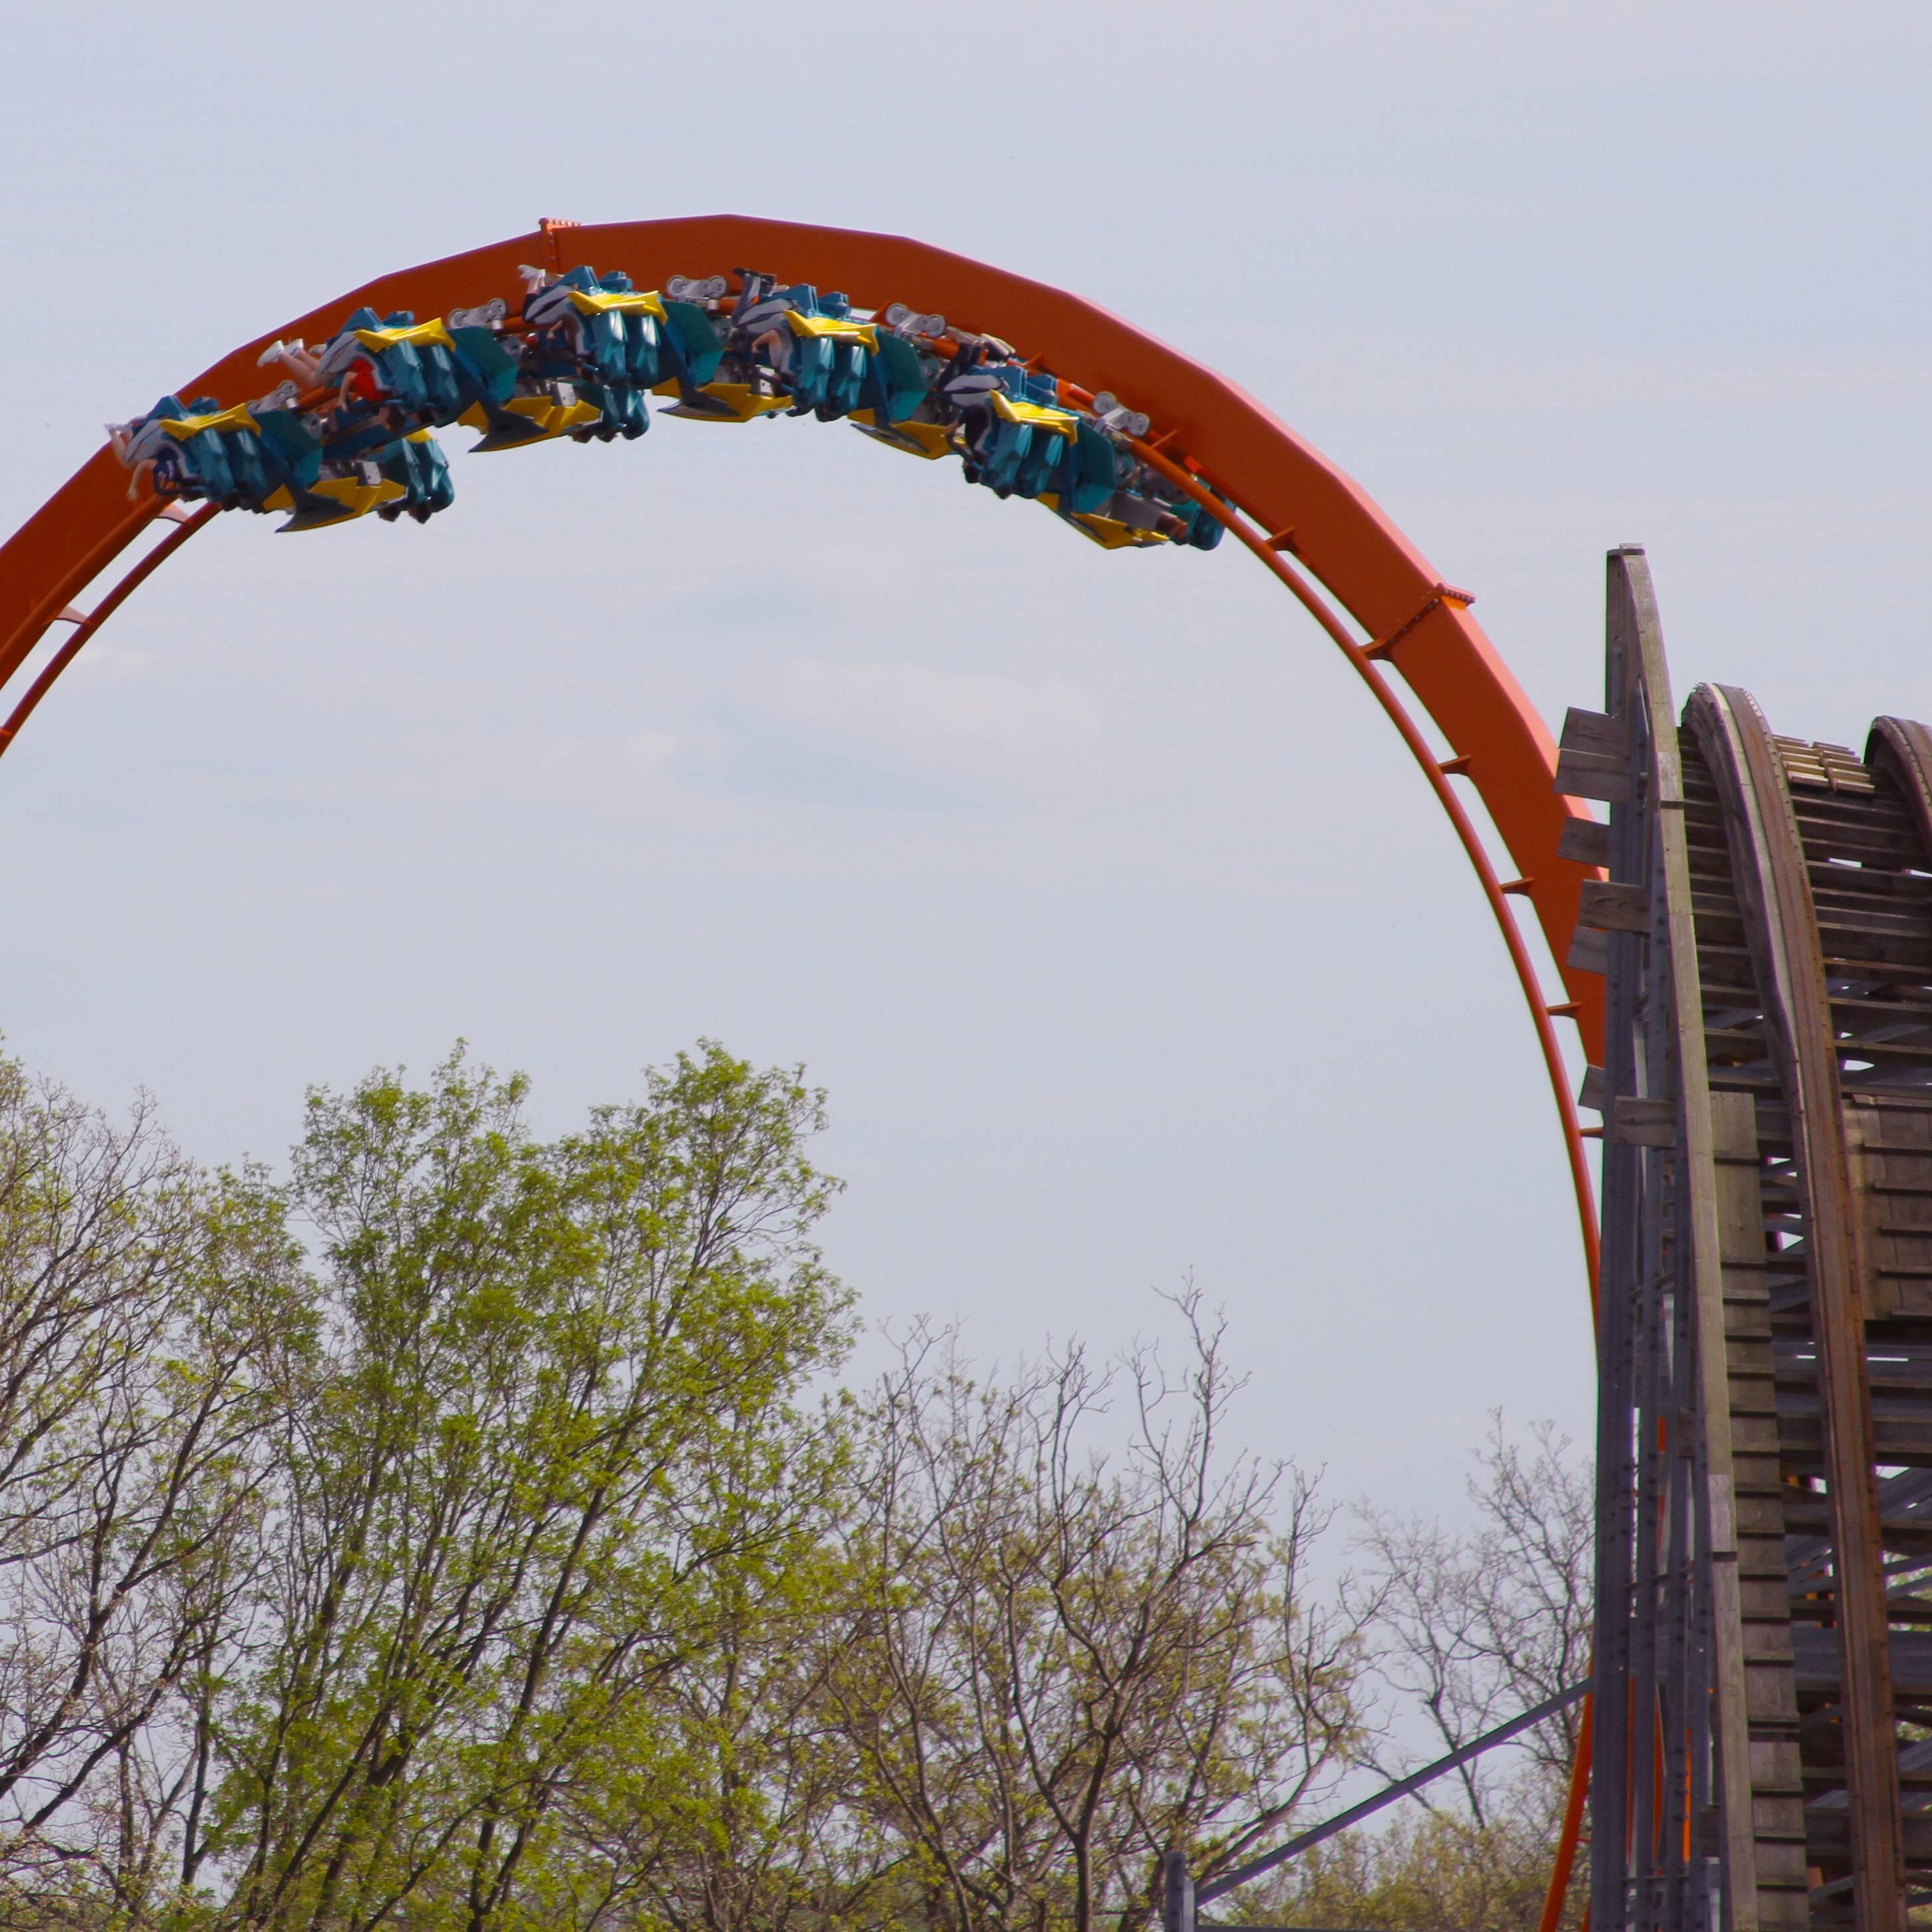 Thunderbird - Vertical Loop and Voyage Hill | Holiday World & Splashin' Safari